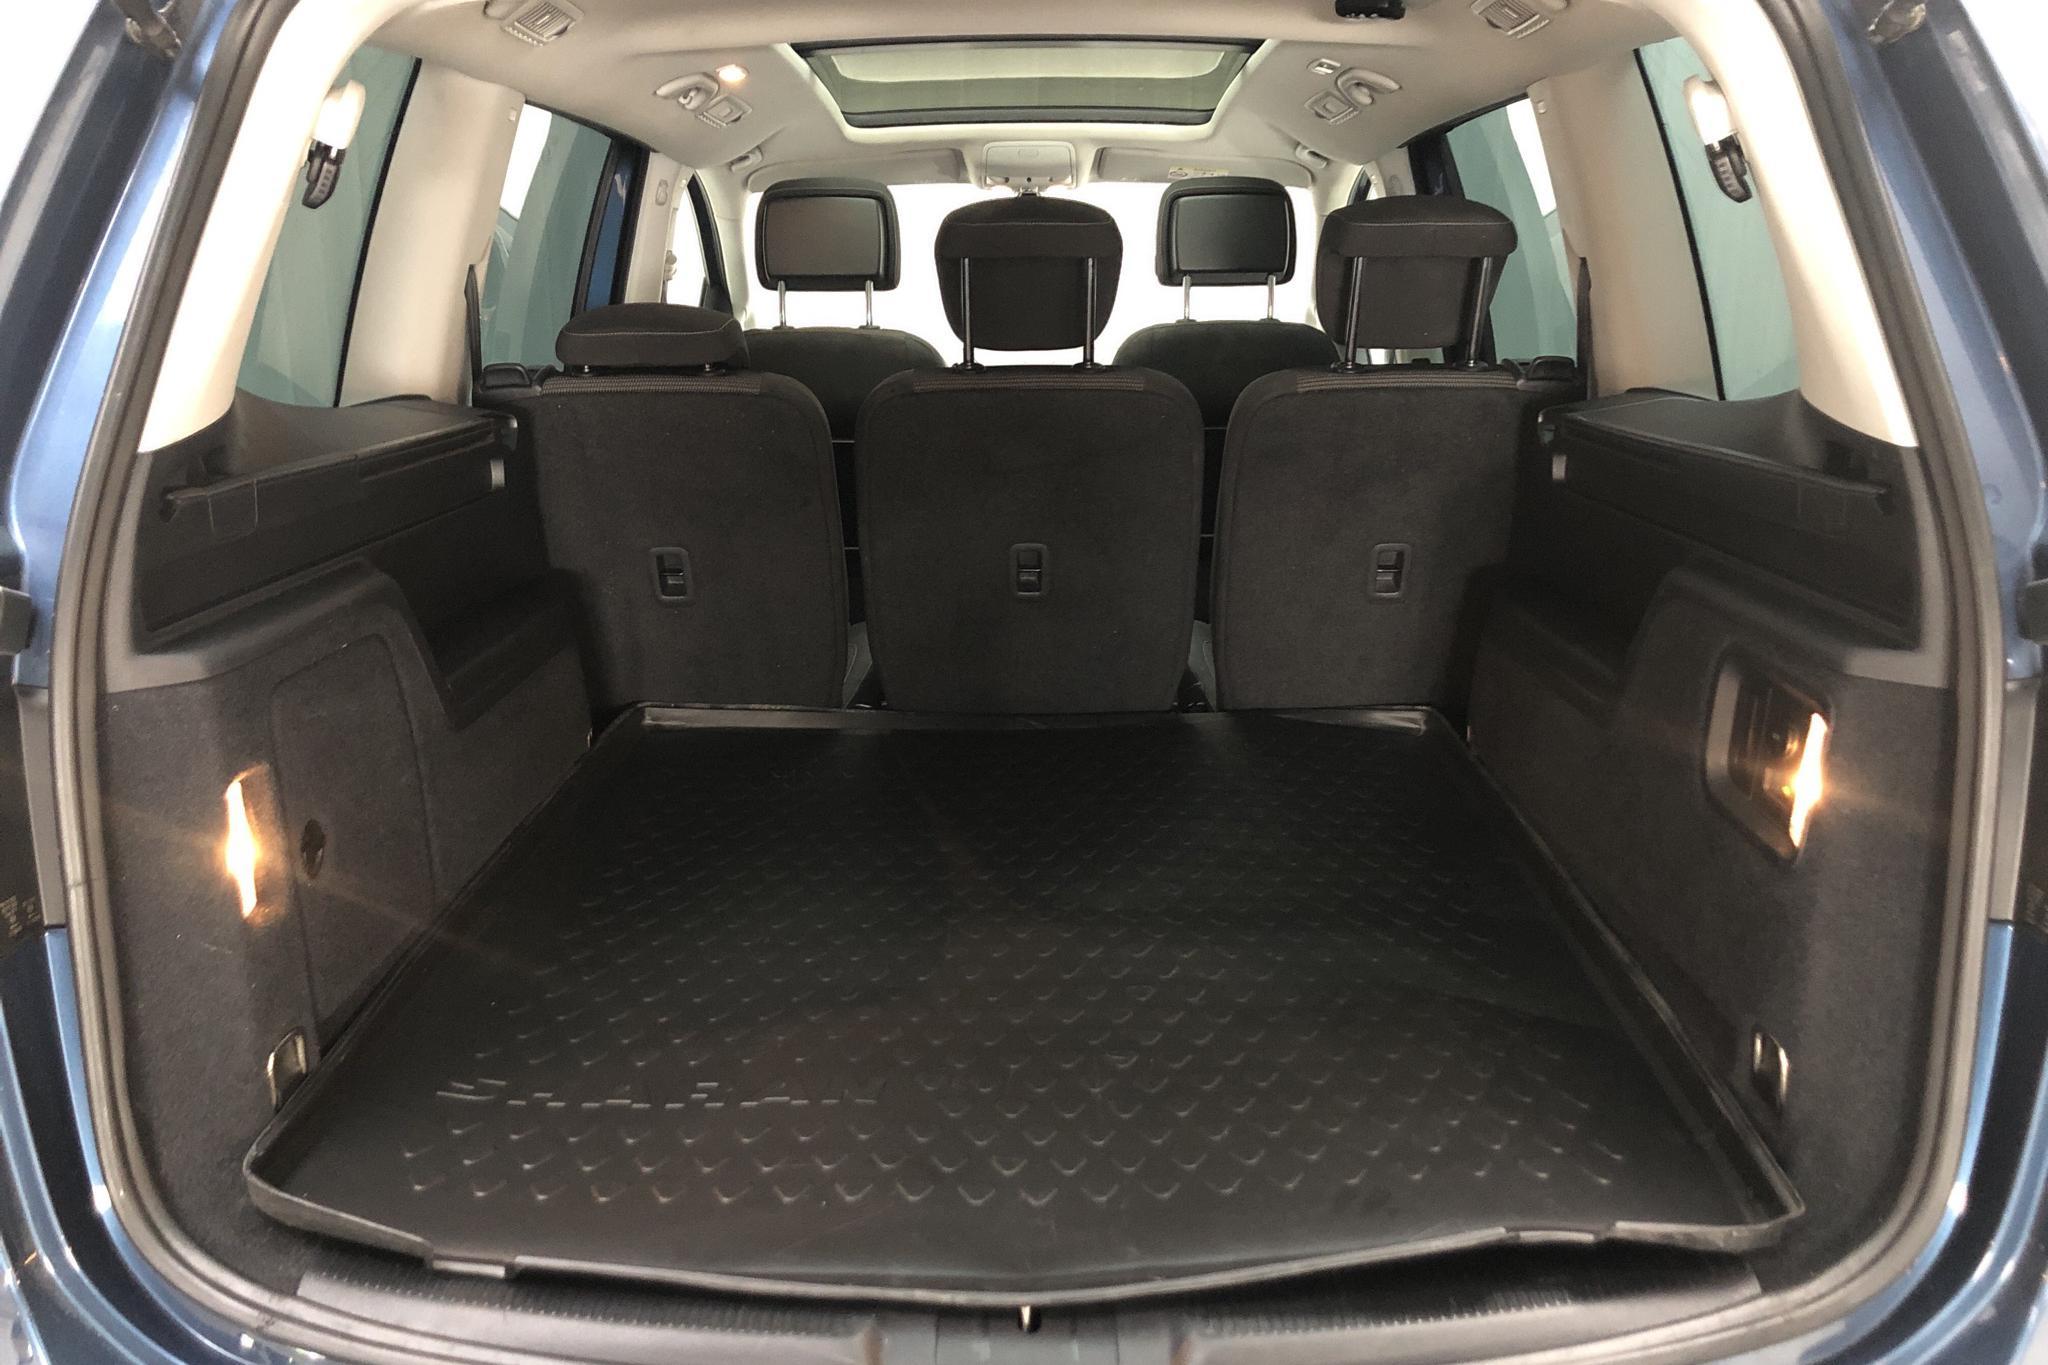 VW Sharan 2.0 TDI (150hk) - 12 925 mil - Automat - blå - 2016